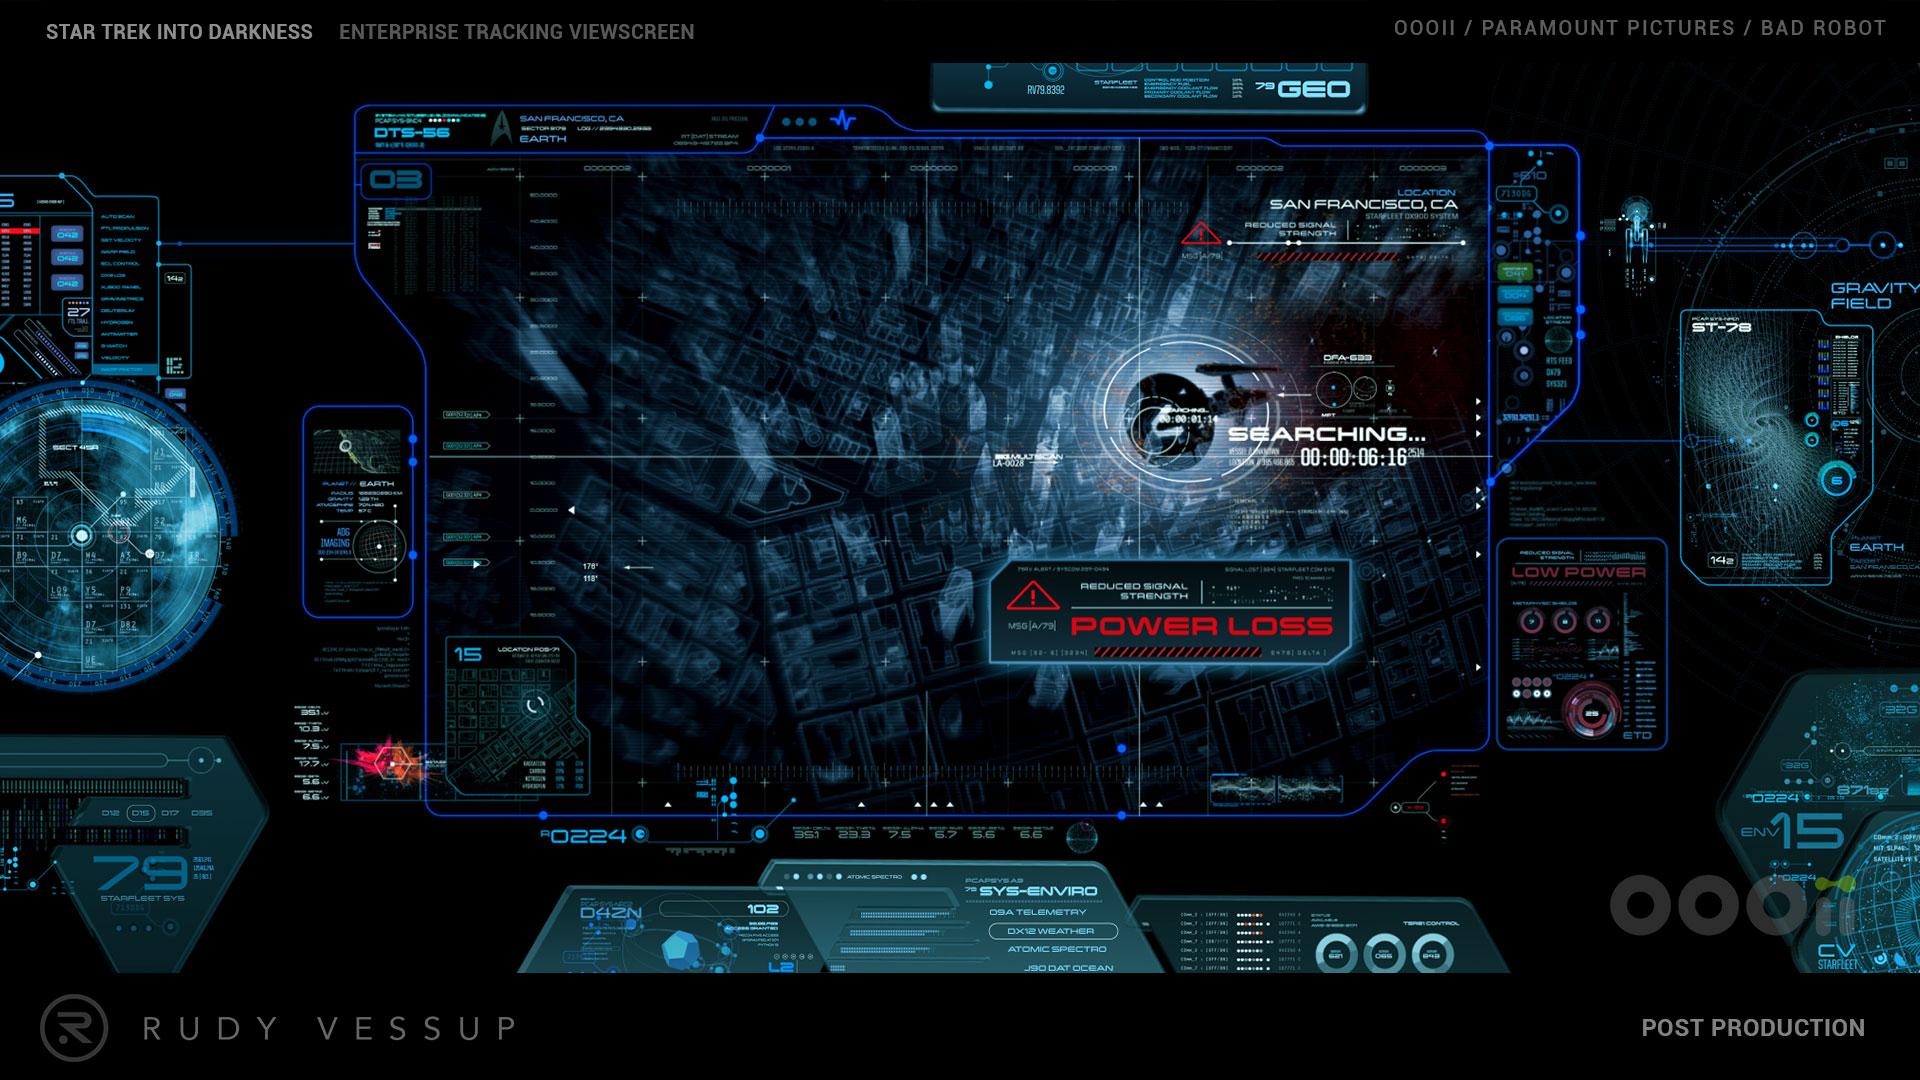 star_trek_viewscreen_interface_design_vessup.jpg